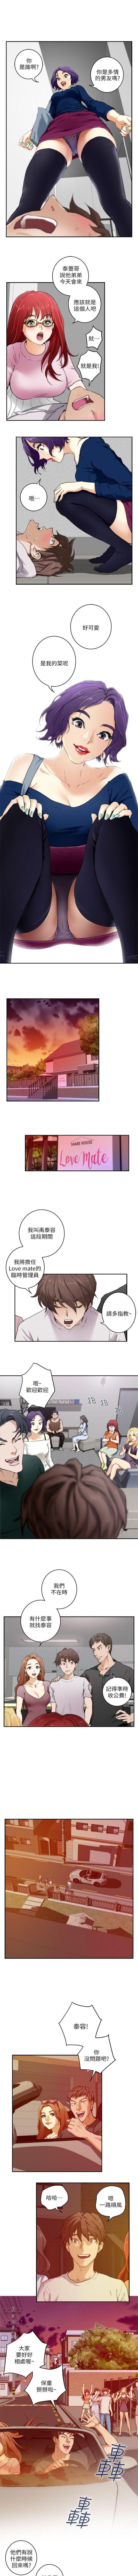 S-Mate 1-10 中文翻译(更新中) 13